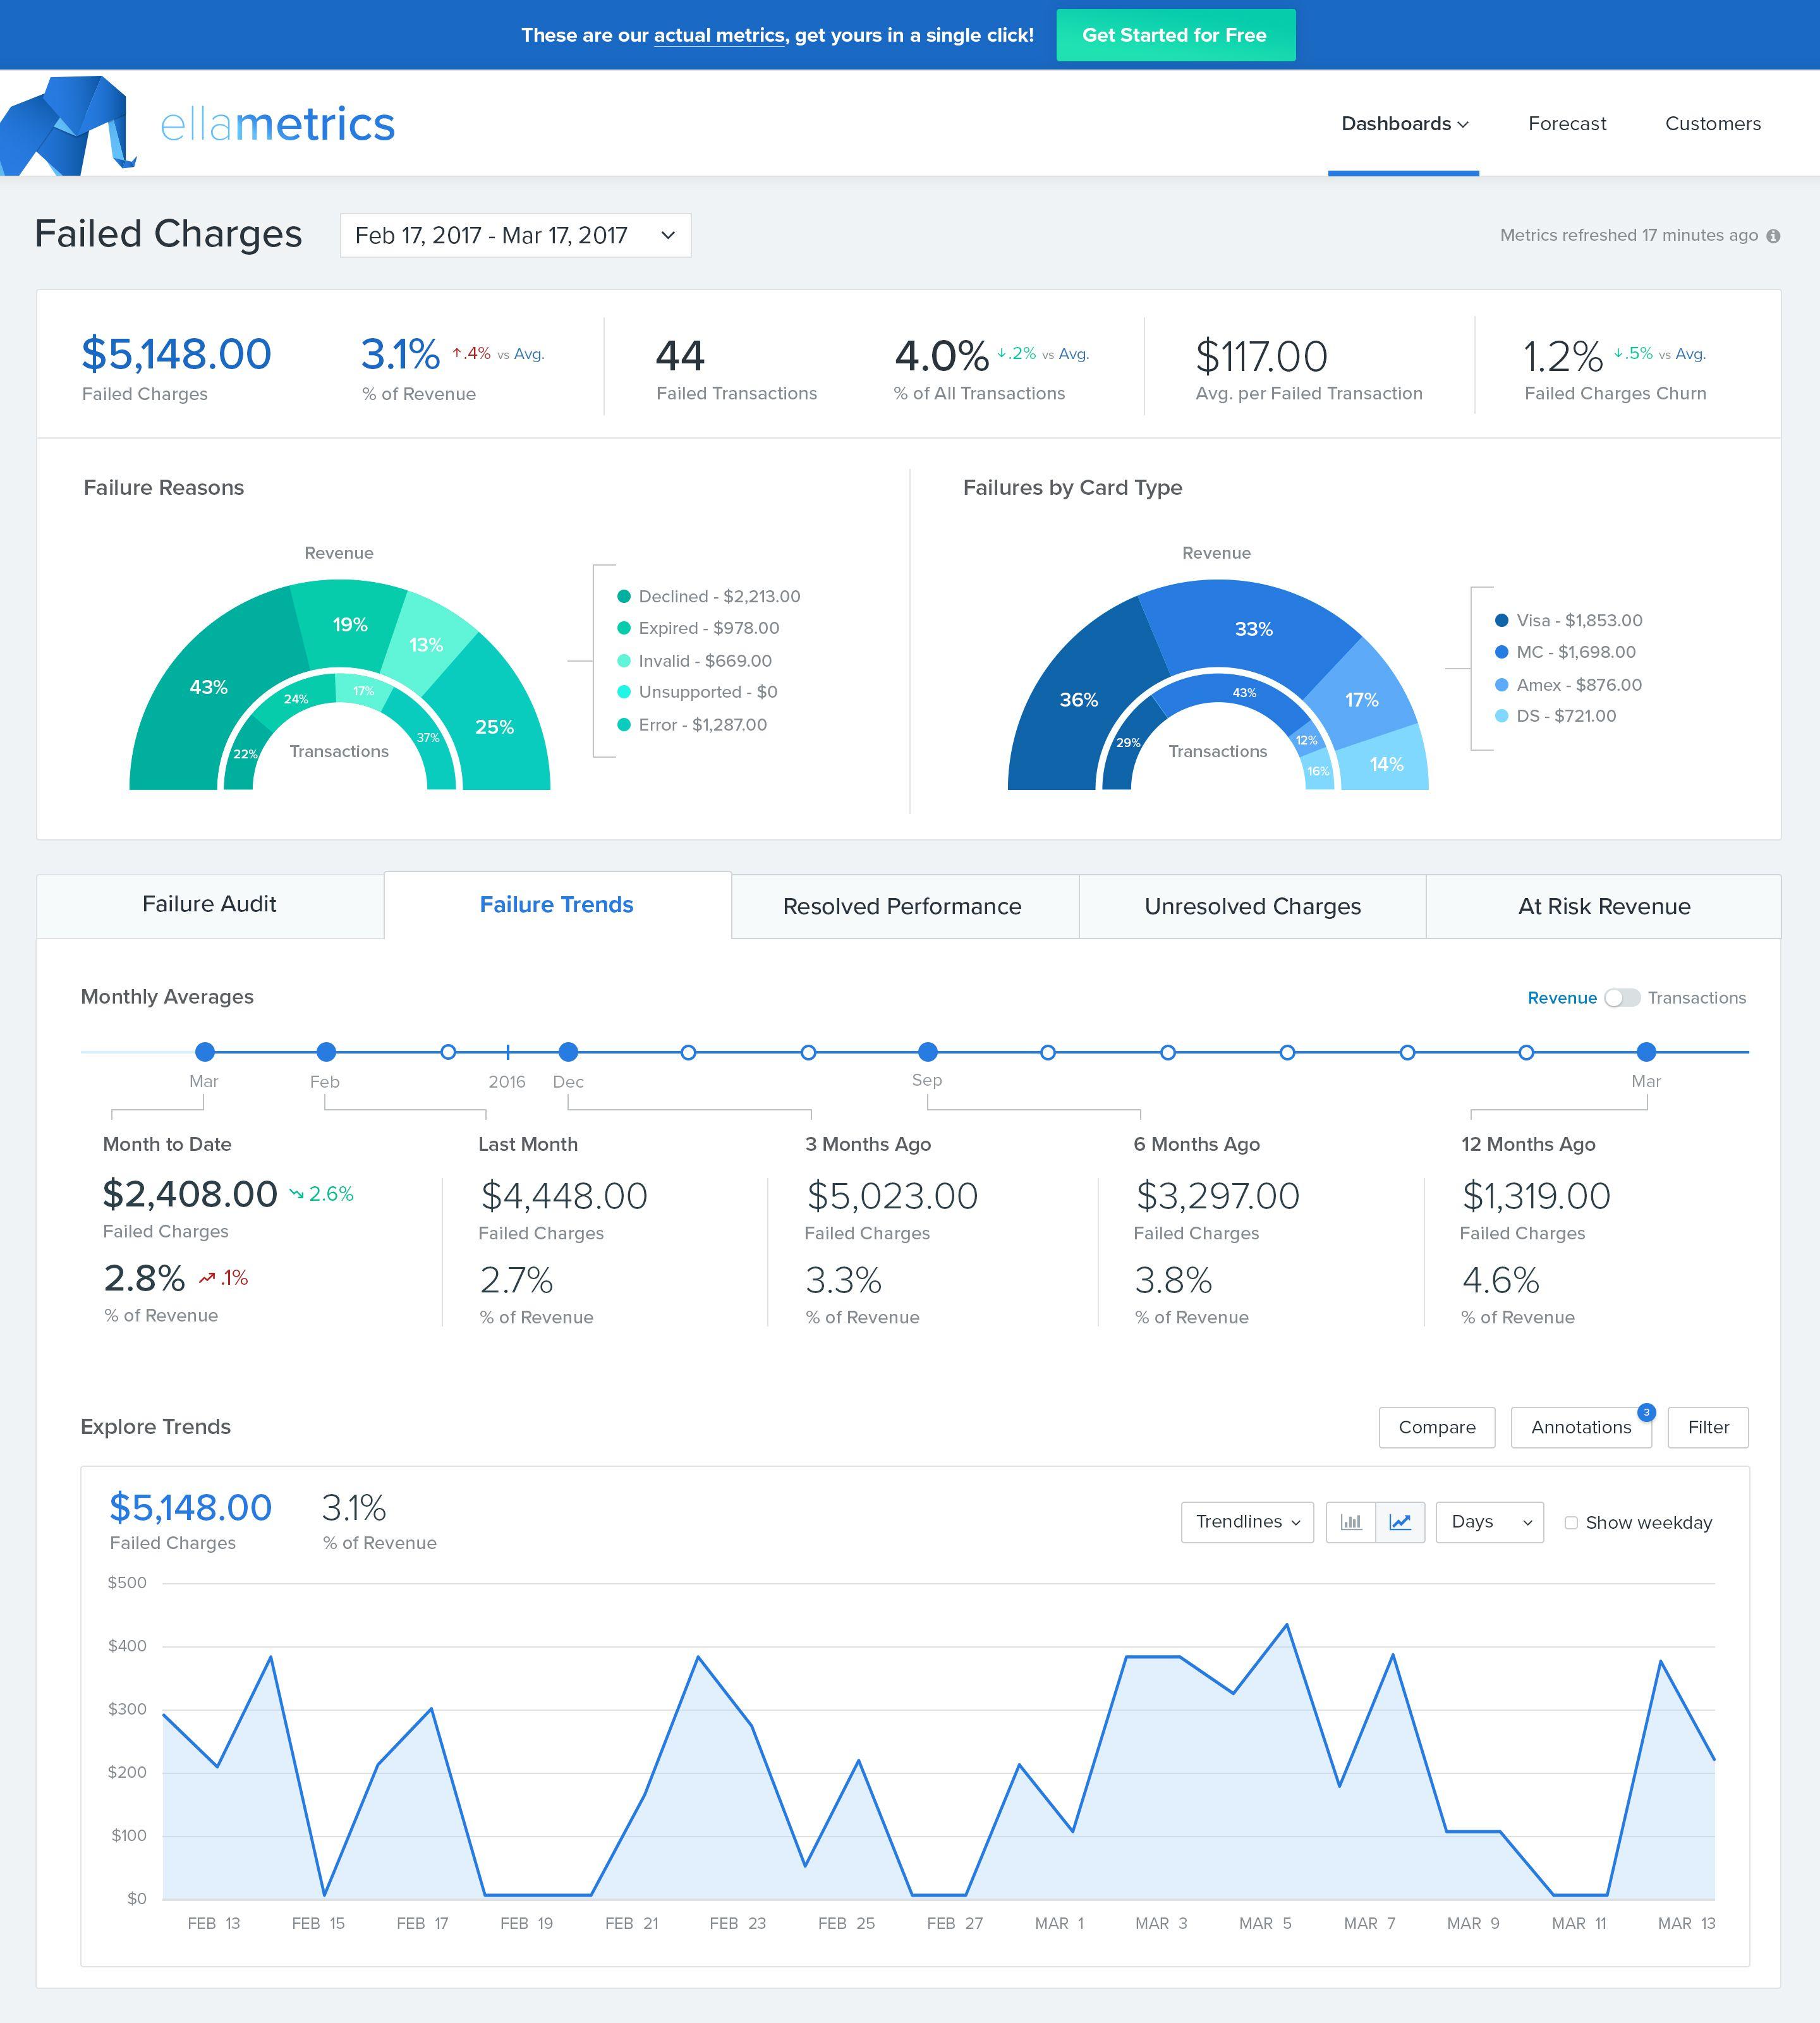 Ellametrics失败费用 Dashboard Design Dashboard Interface Analytics Design